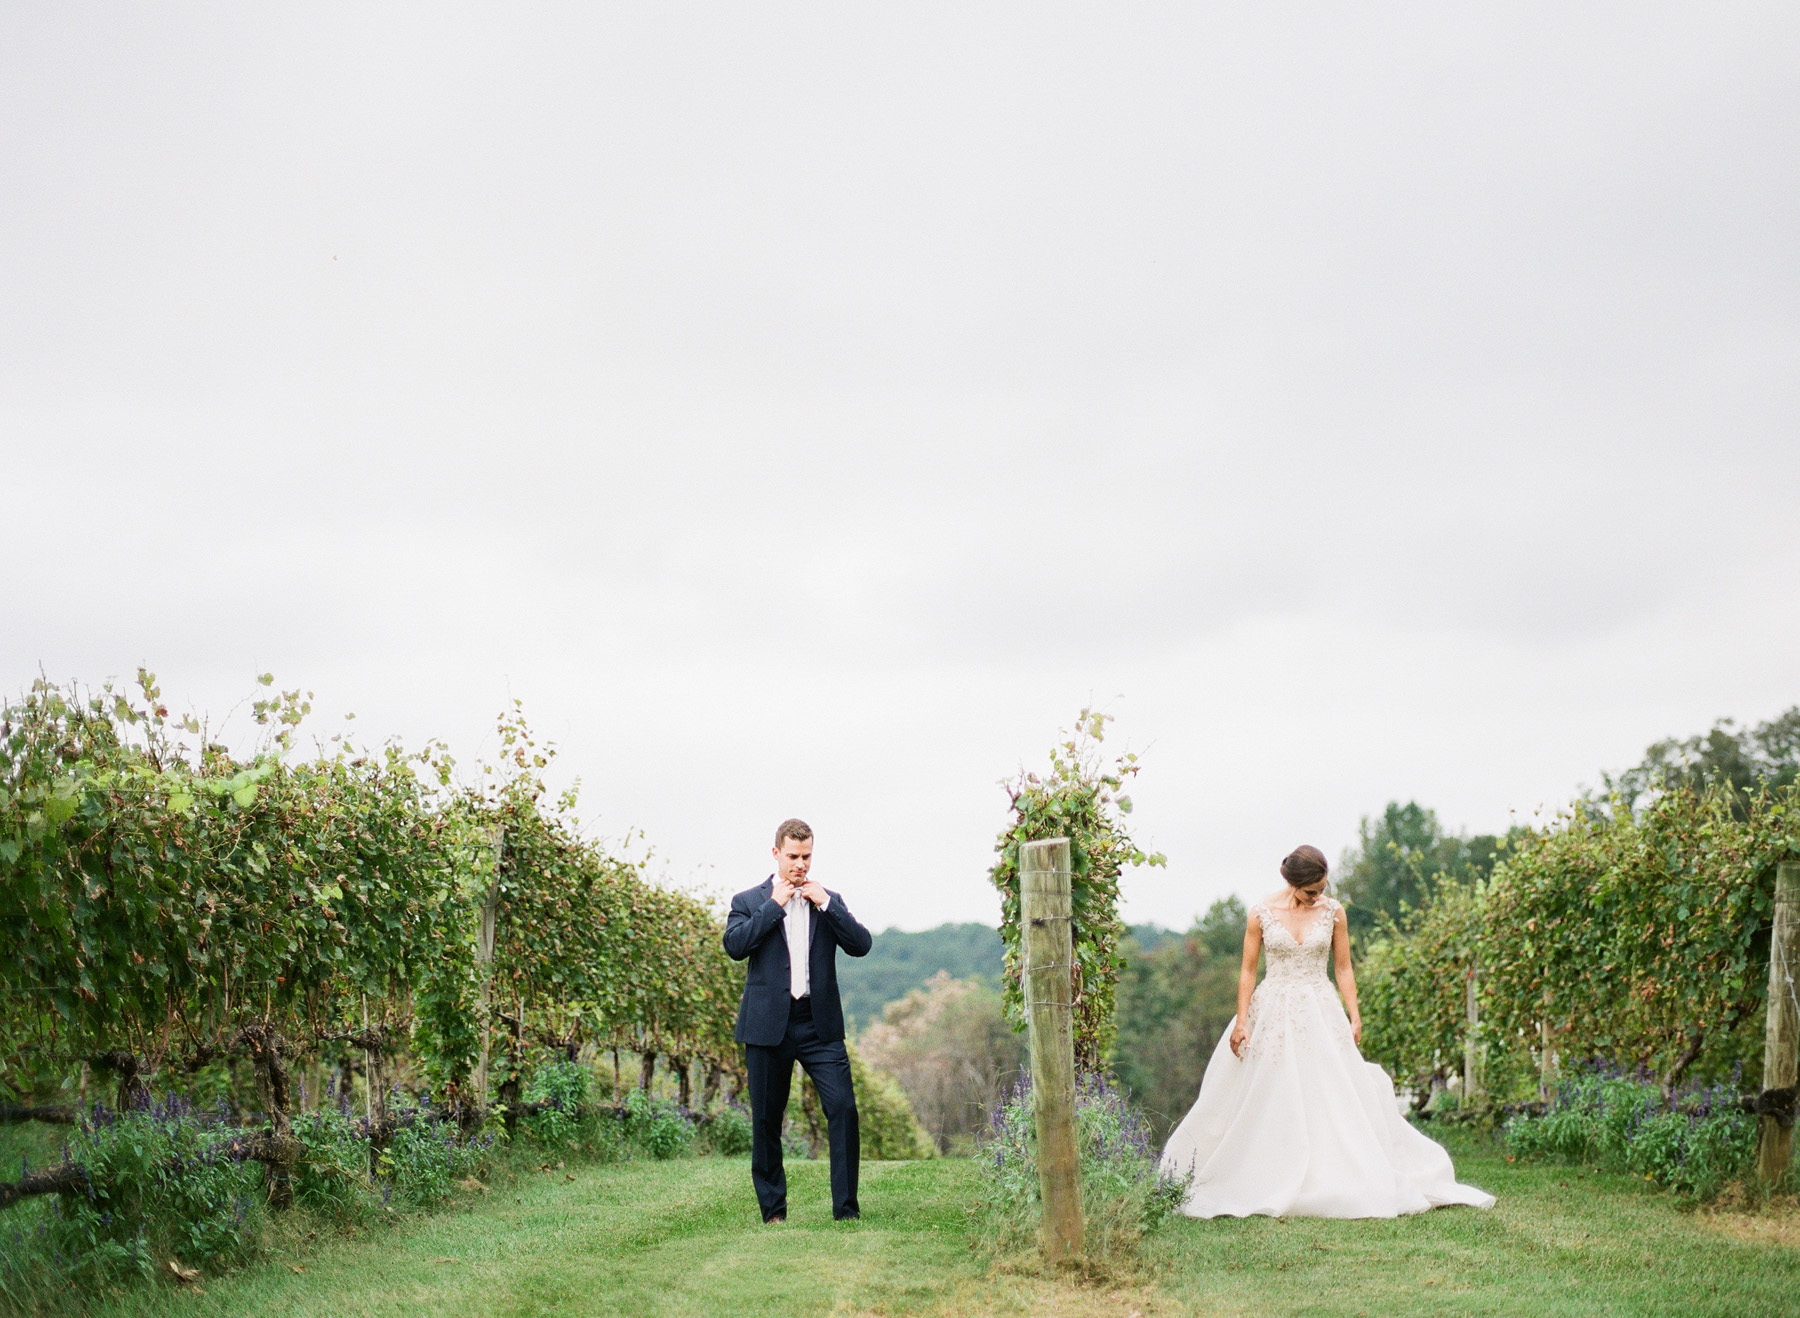 Pippin-Hill-Farm-and-Vinyards-Wedding-Film-Photography-19.jpg